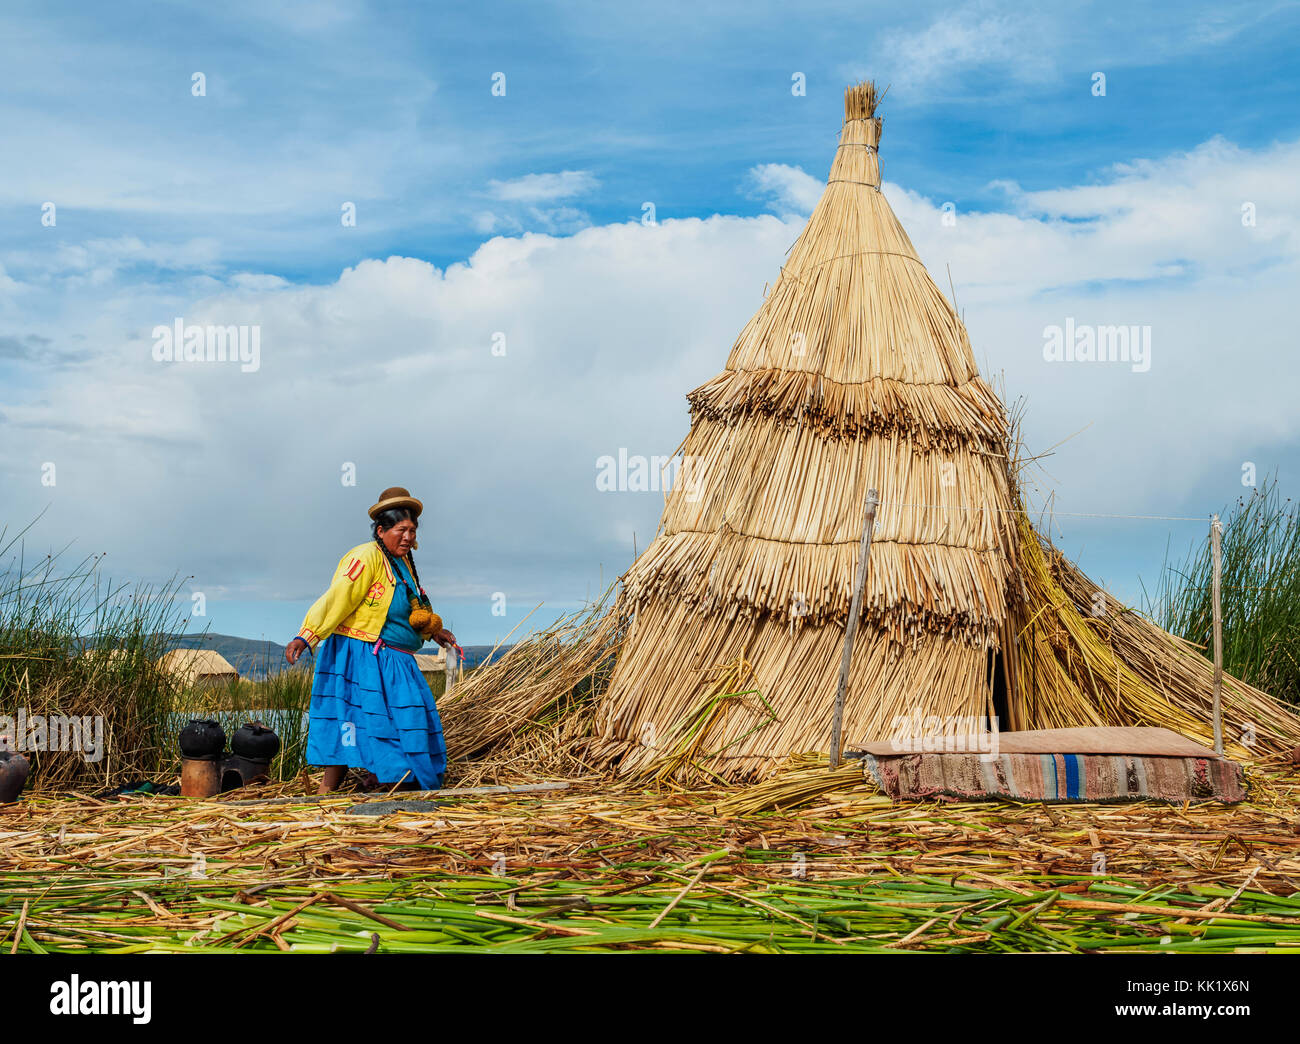 Native Uro Lady, Uros Floating Islands, Lake Titicaca, Puno Region, Peru - Stock Image